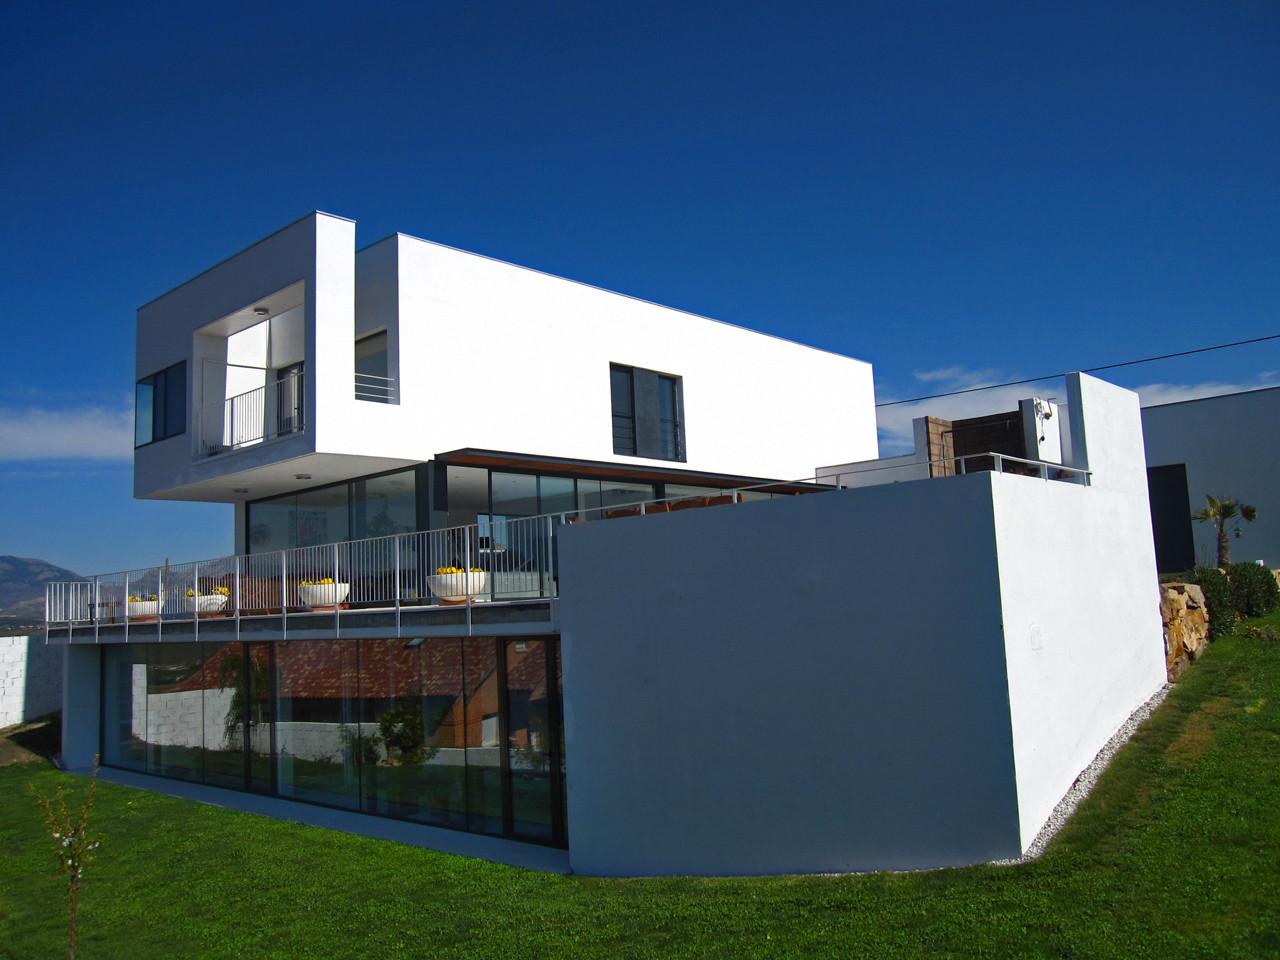 Casa Ramas / fh2l Arquitectos, © fh2l arquitectos